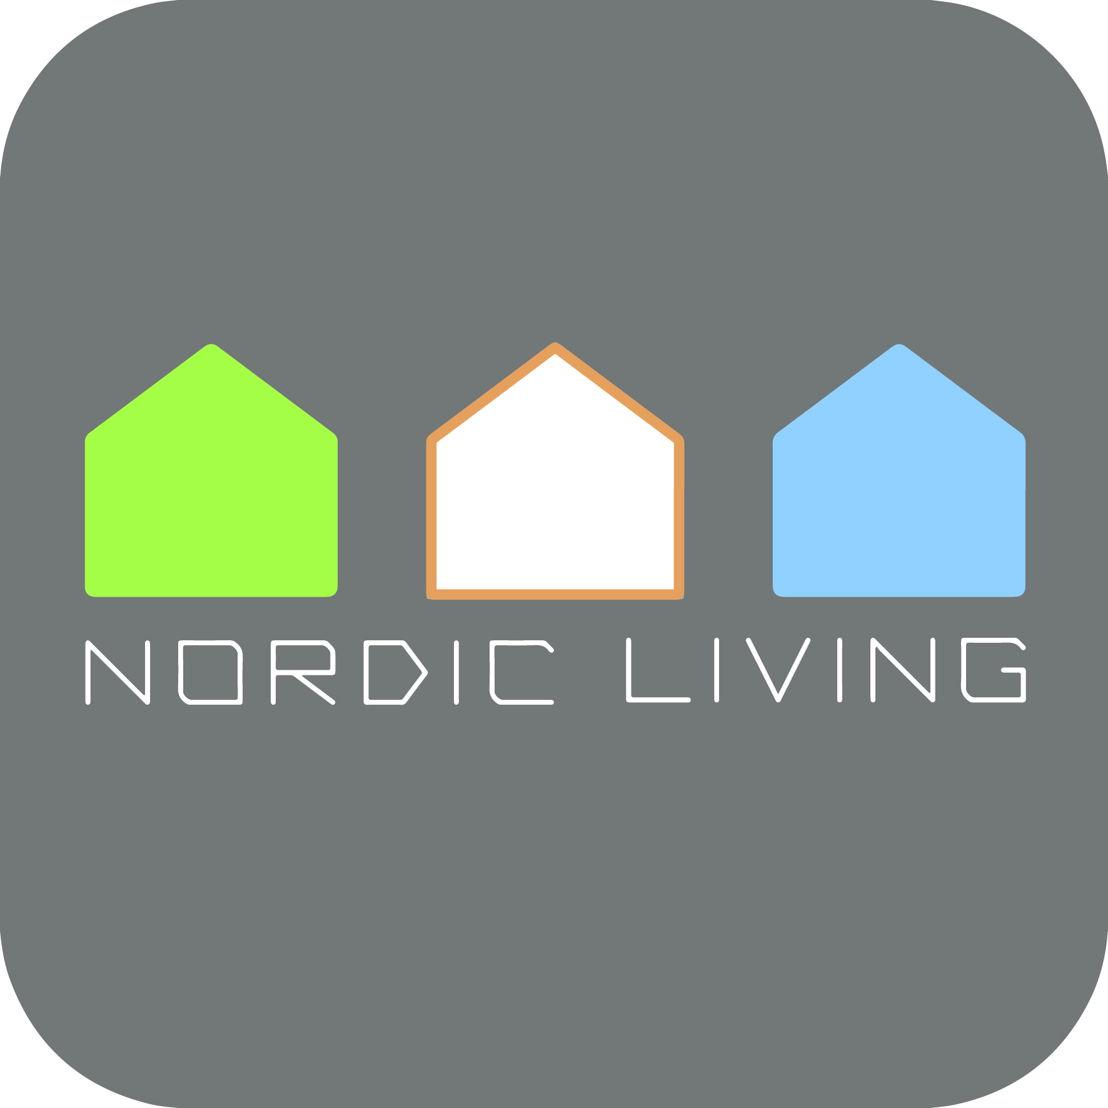 Nordic Living logo CMYK